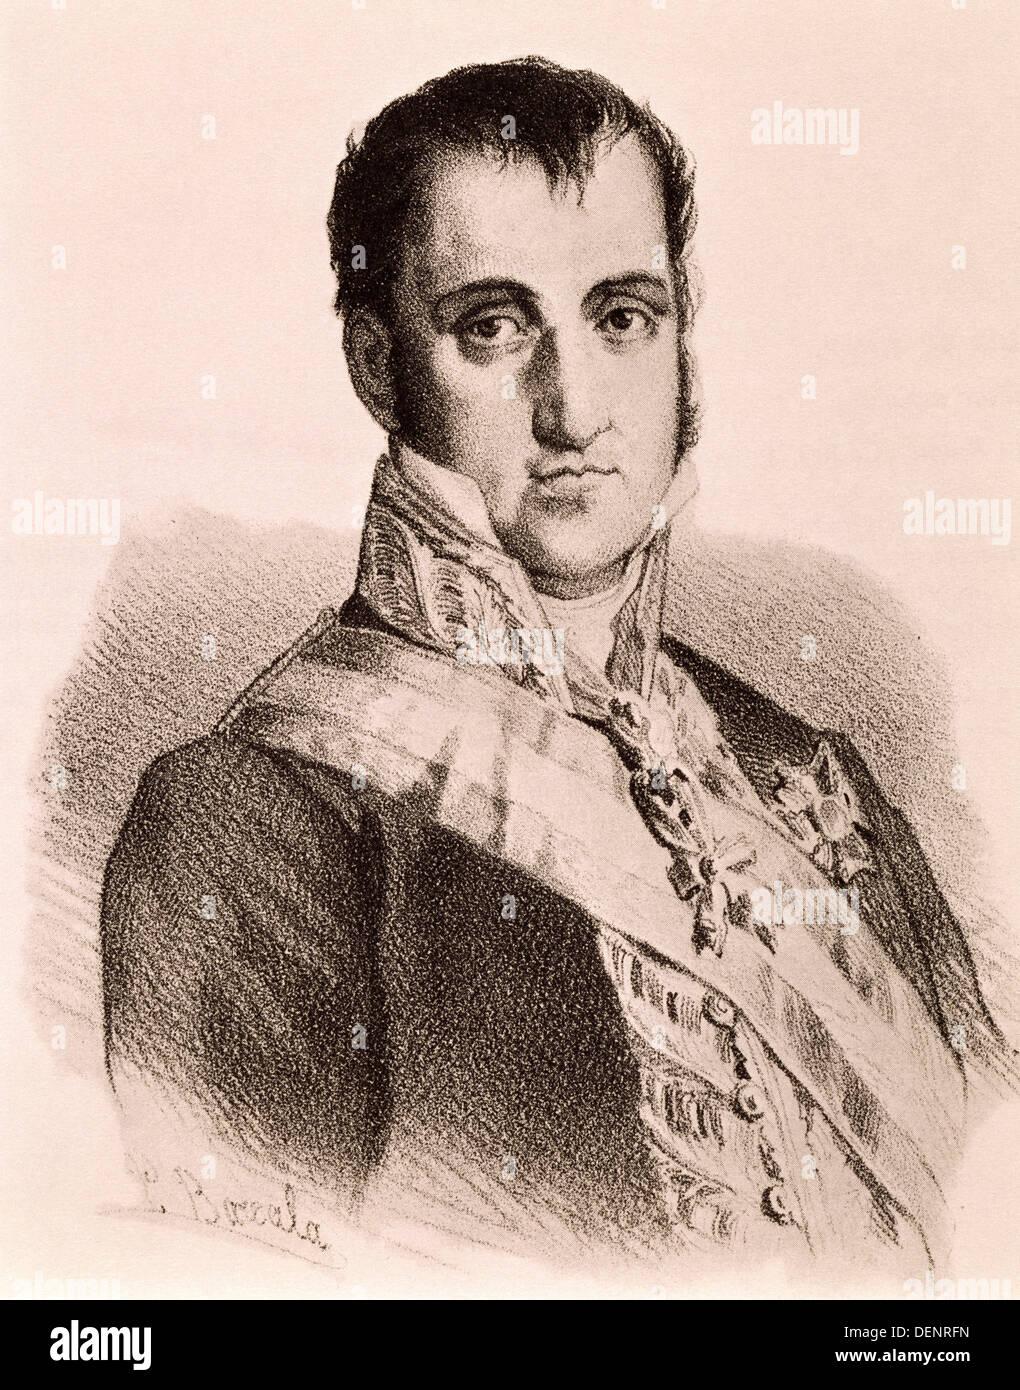 Ferdinand VII (1784-1833), King of Spain Stock Photo